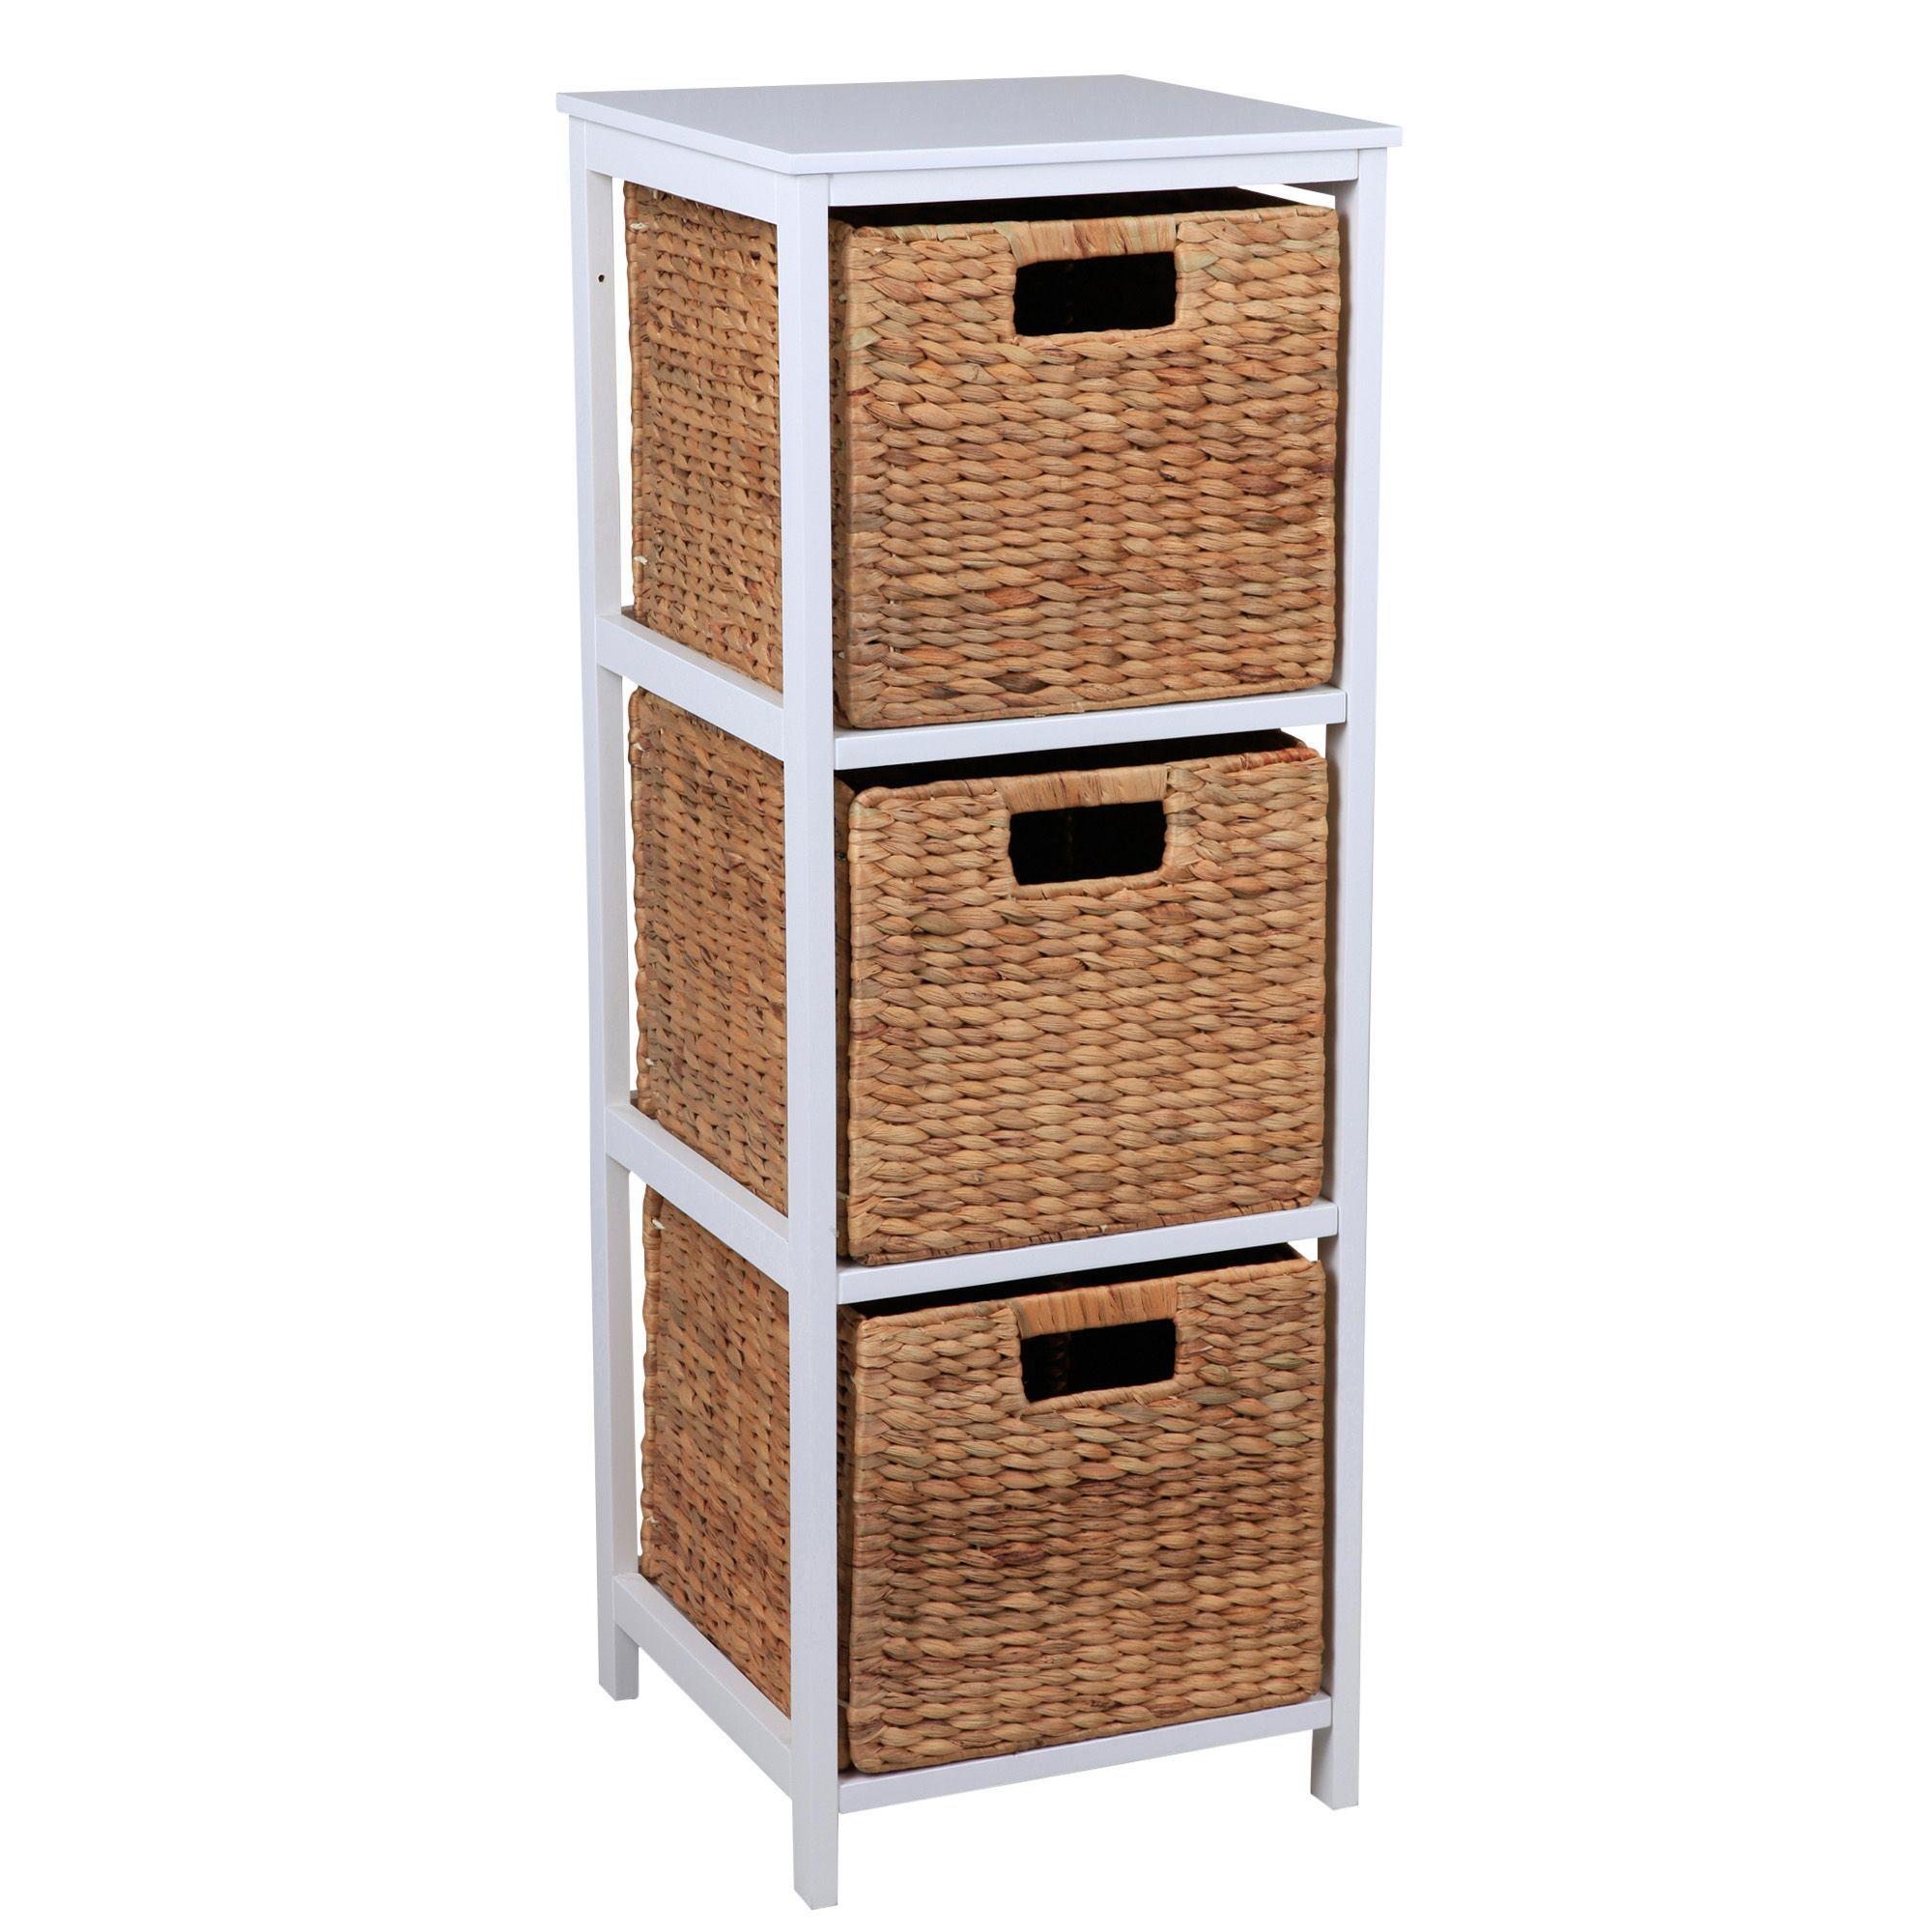 Form Beige & White Mdf & Solid Pine Drawer Tower Unit